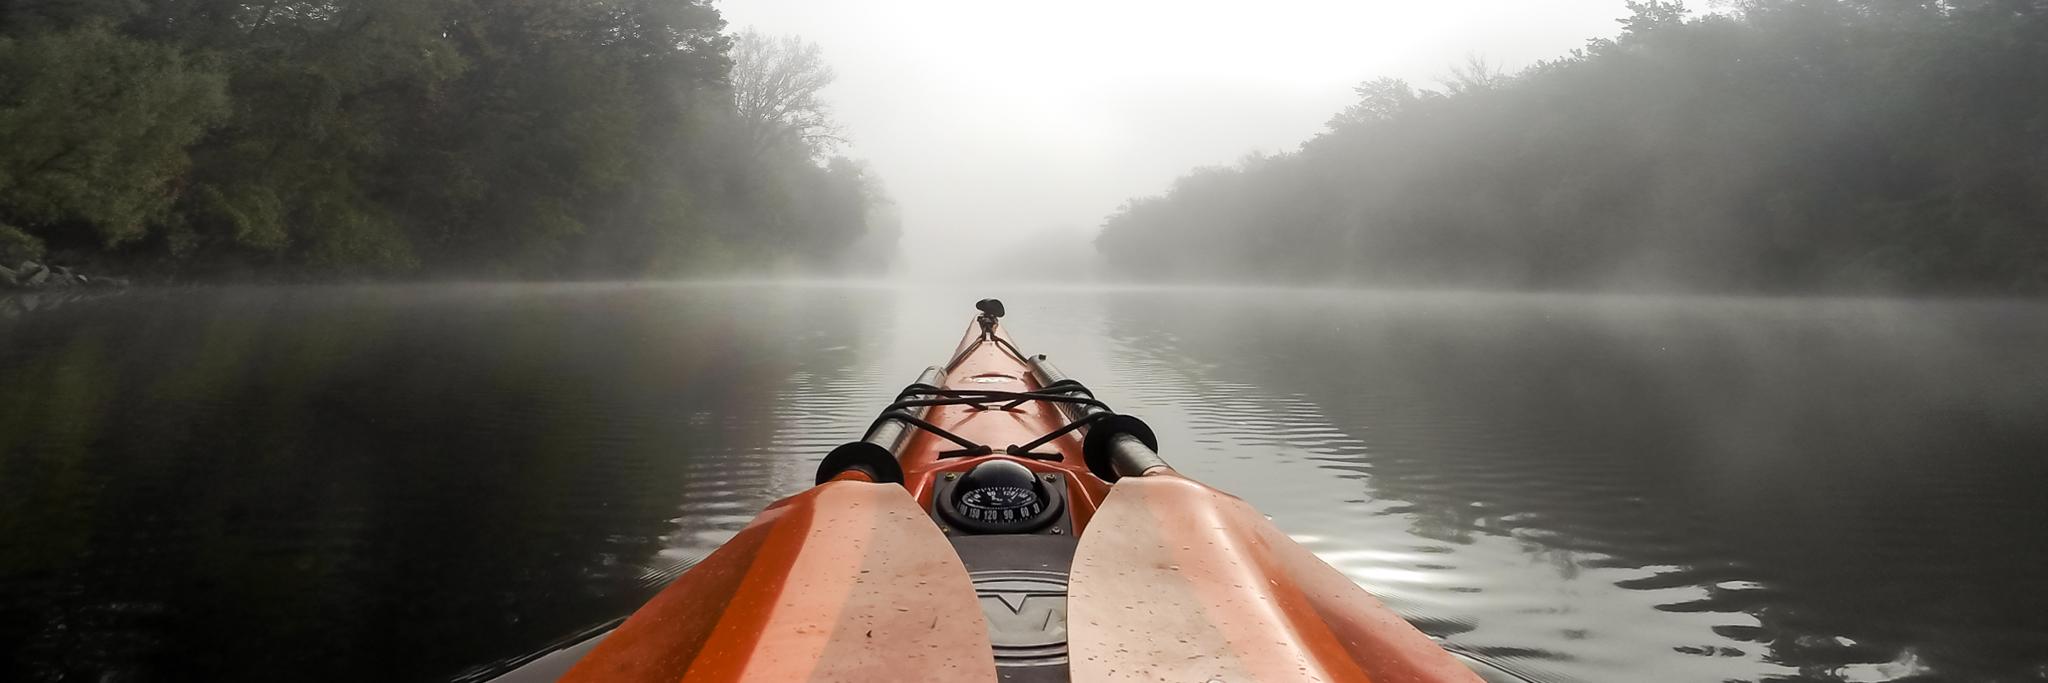 chip_macalpine_erie_canal_kayaking_8406